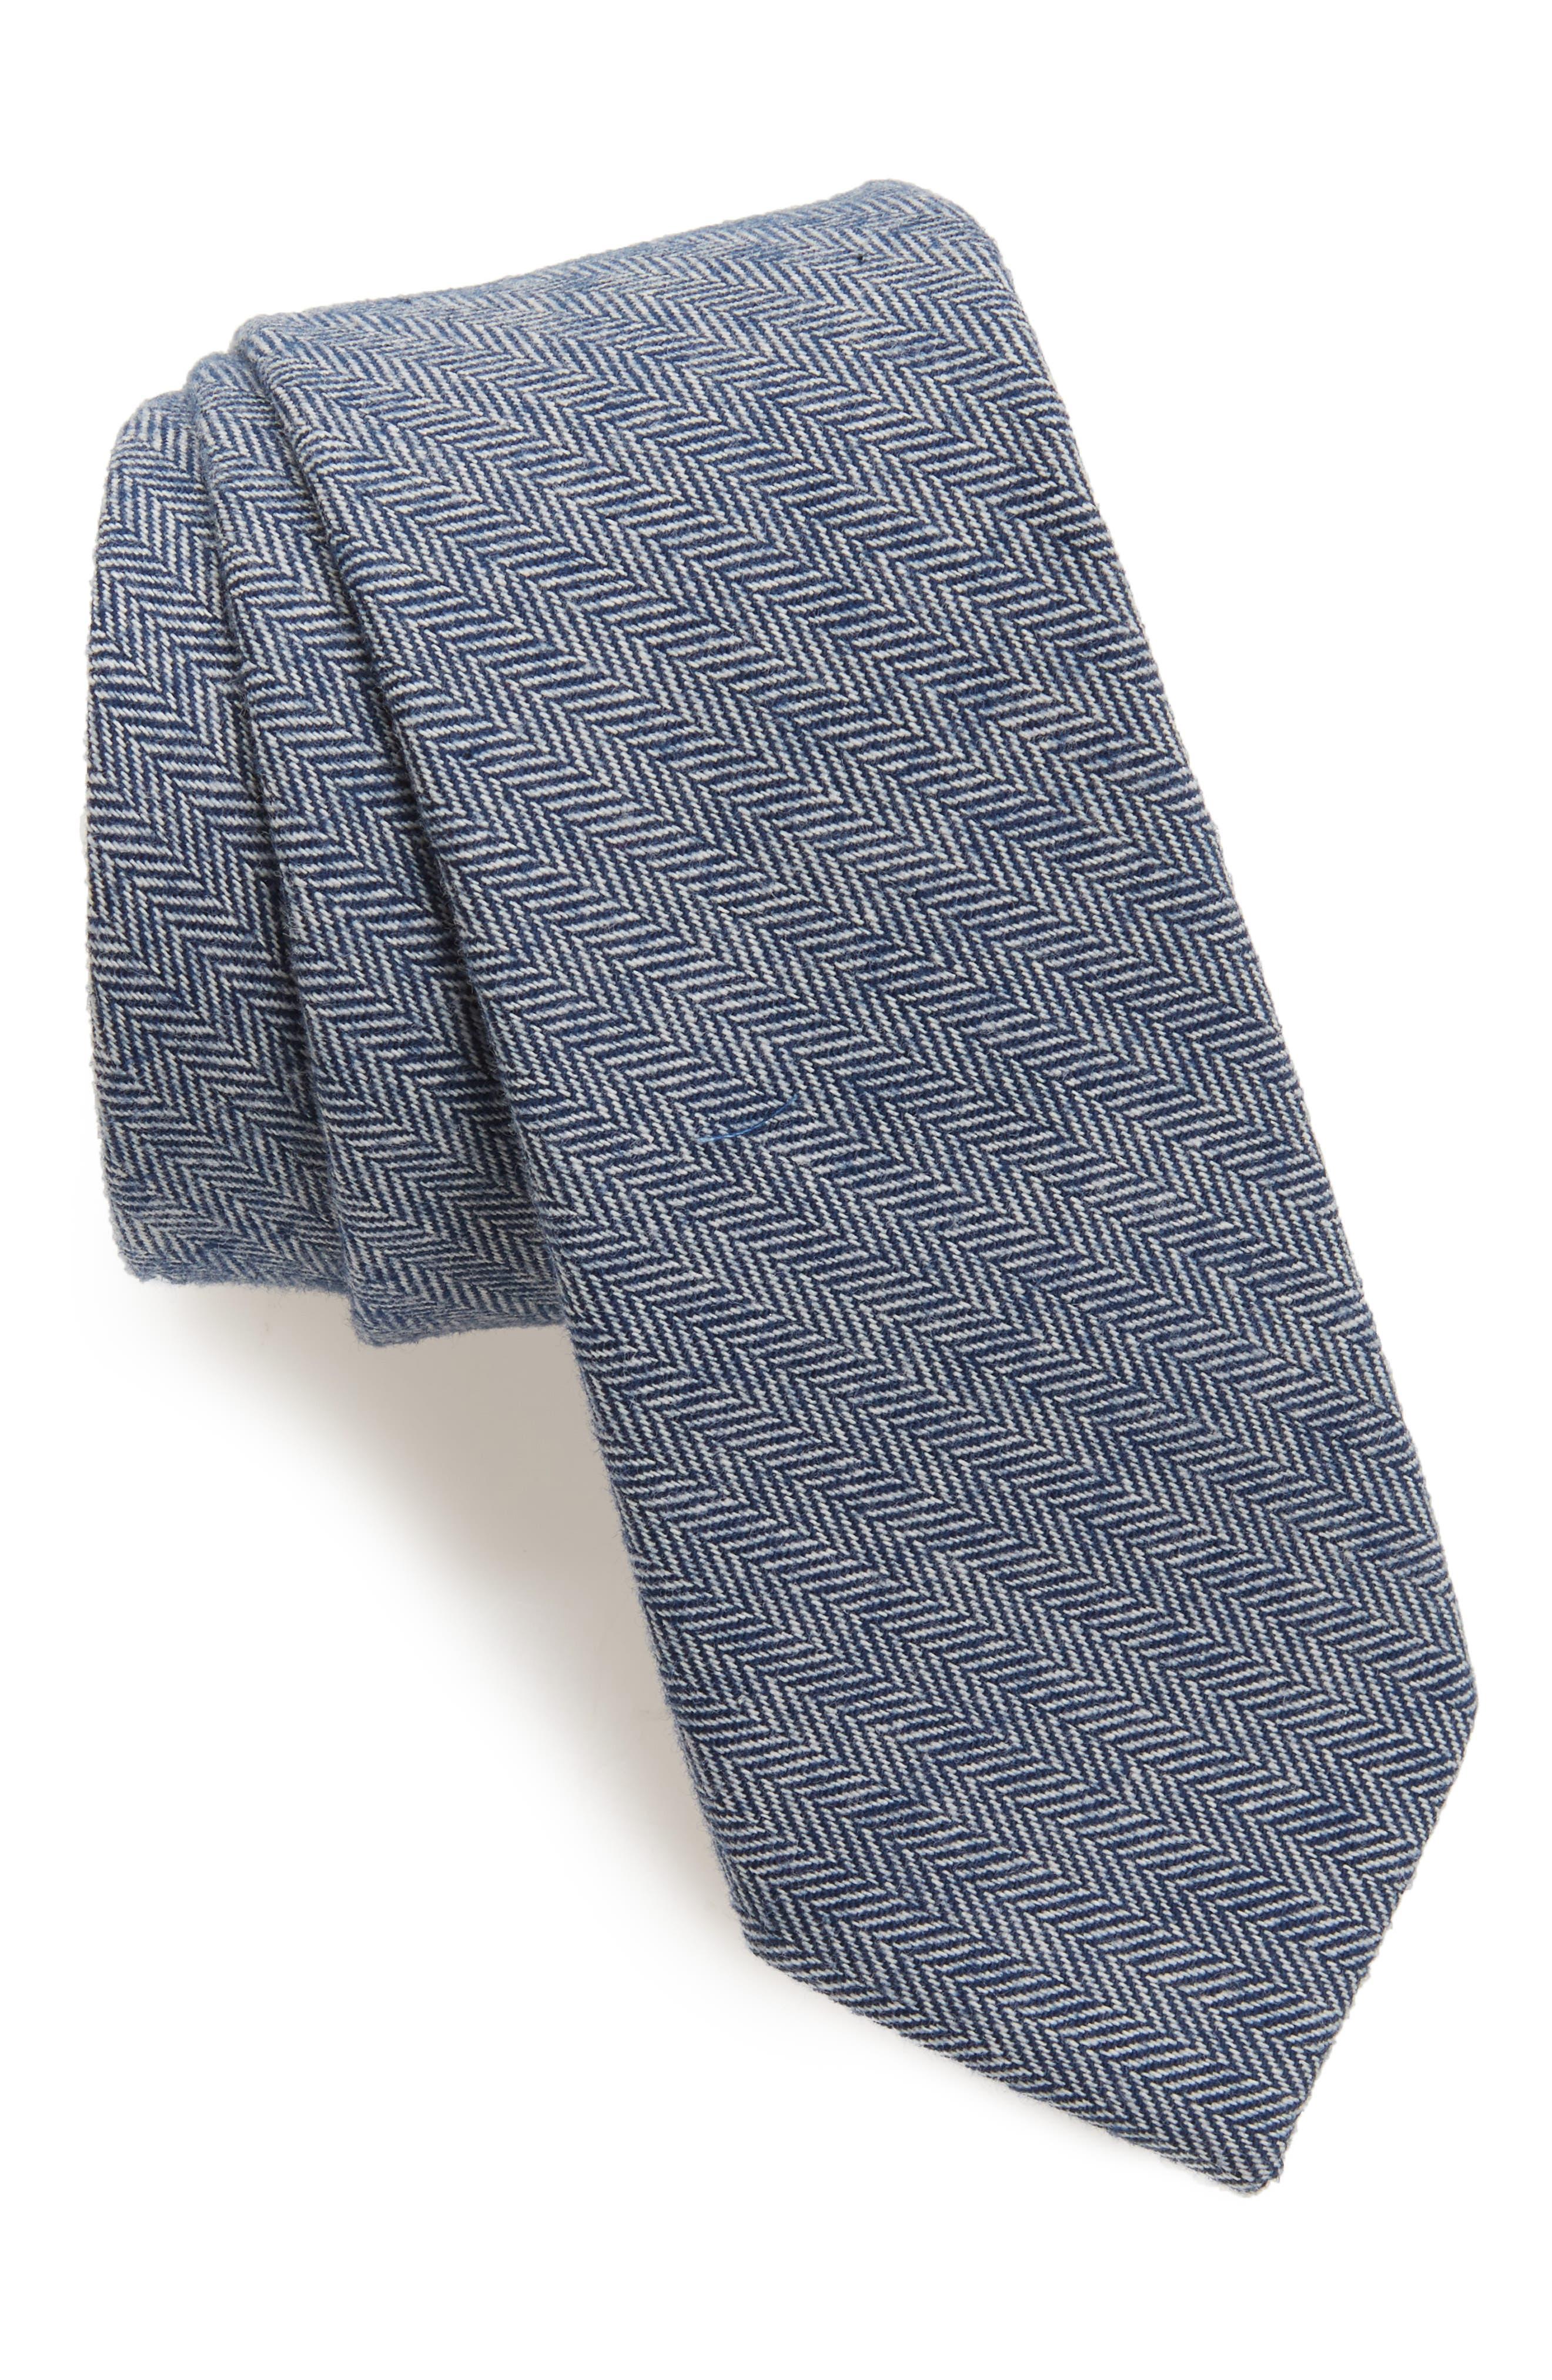 Herringbone Stretch Cotton Tie,                         Main,                         color, Navy